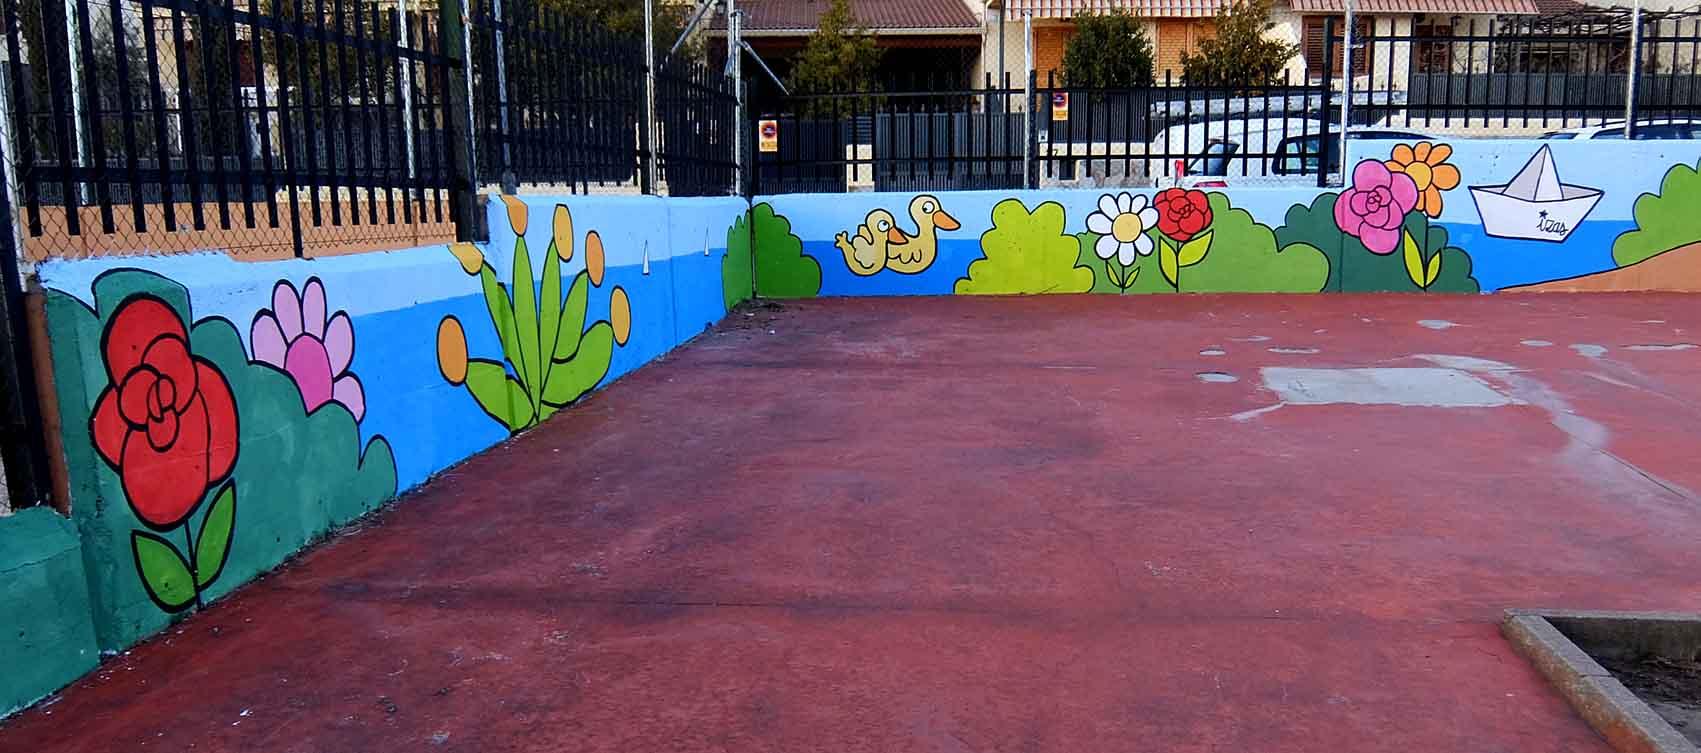 mural izas tierno galván infantil 1